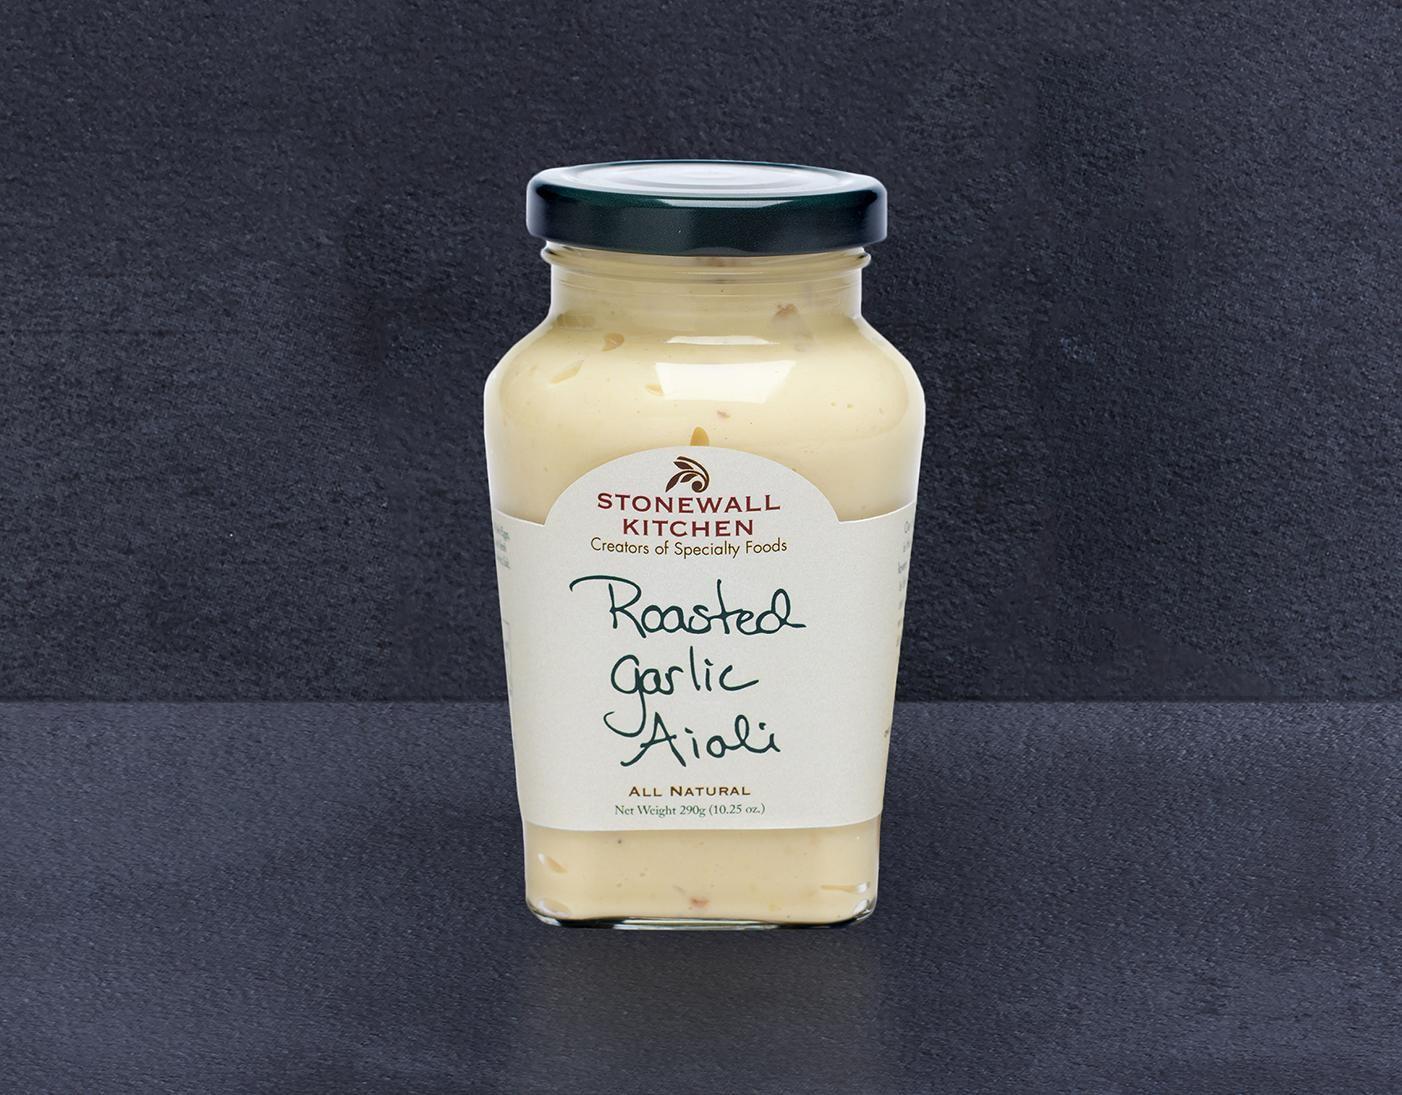 Stonewall Kitchen »Roasted Garlic Aioli« jetzt kaufen!